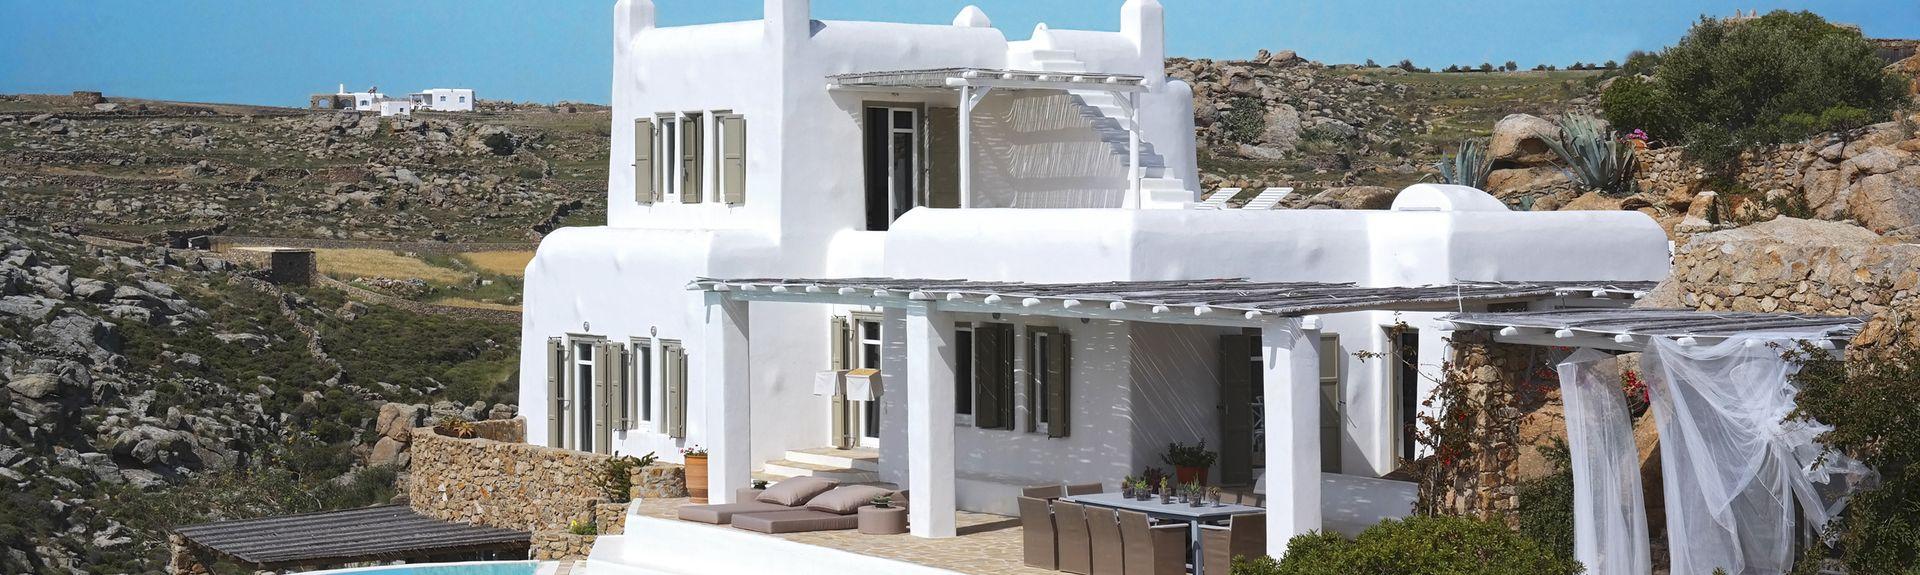 Platis Gialos Beach, Mykonos, Greece